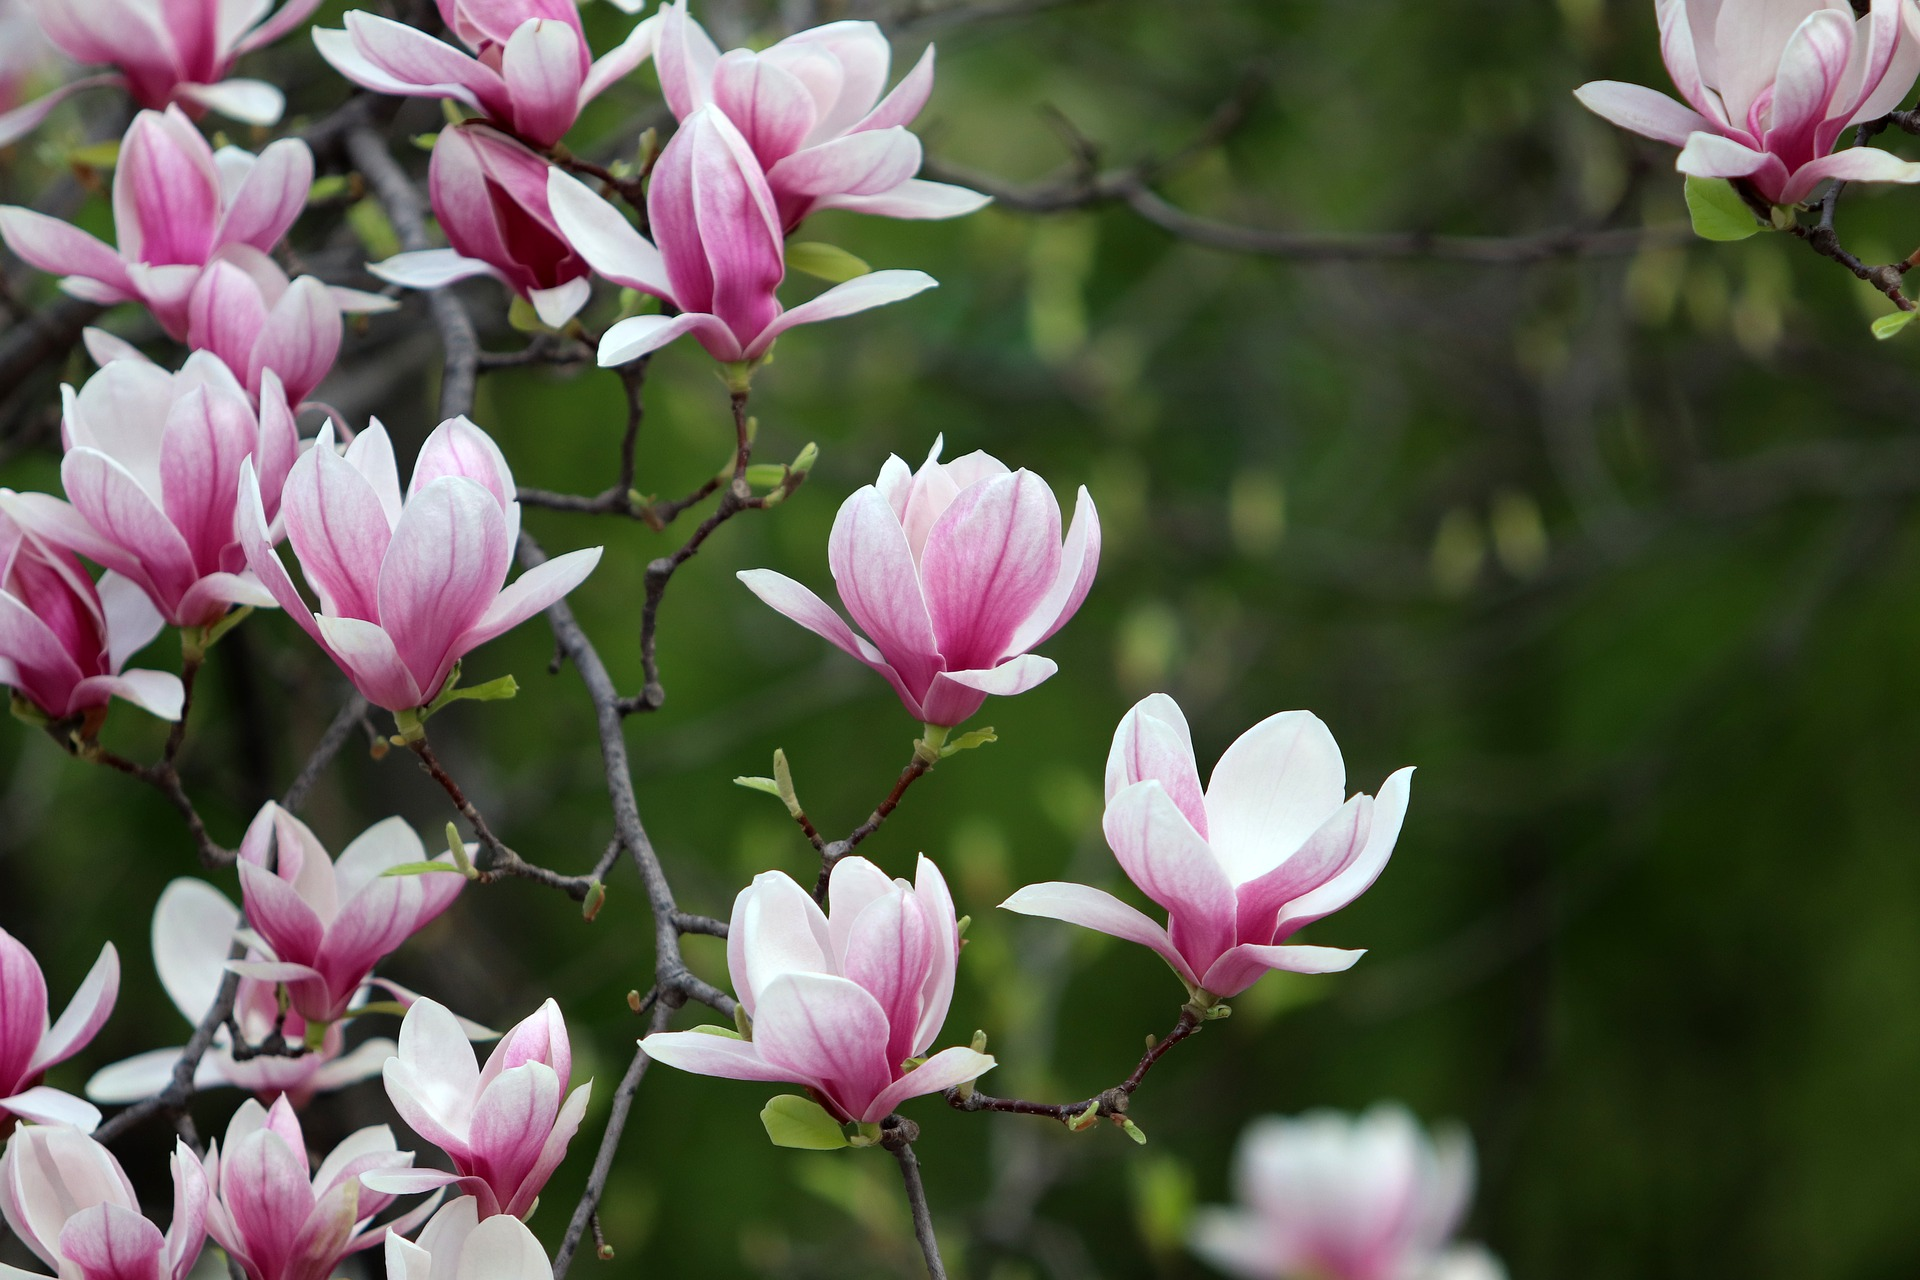 Magnolia Blossoms_1920.jpg